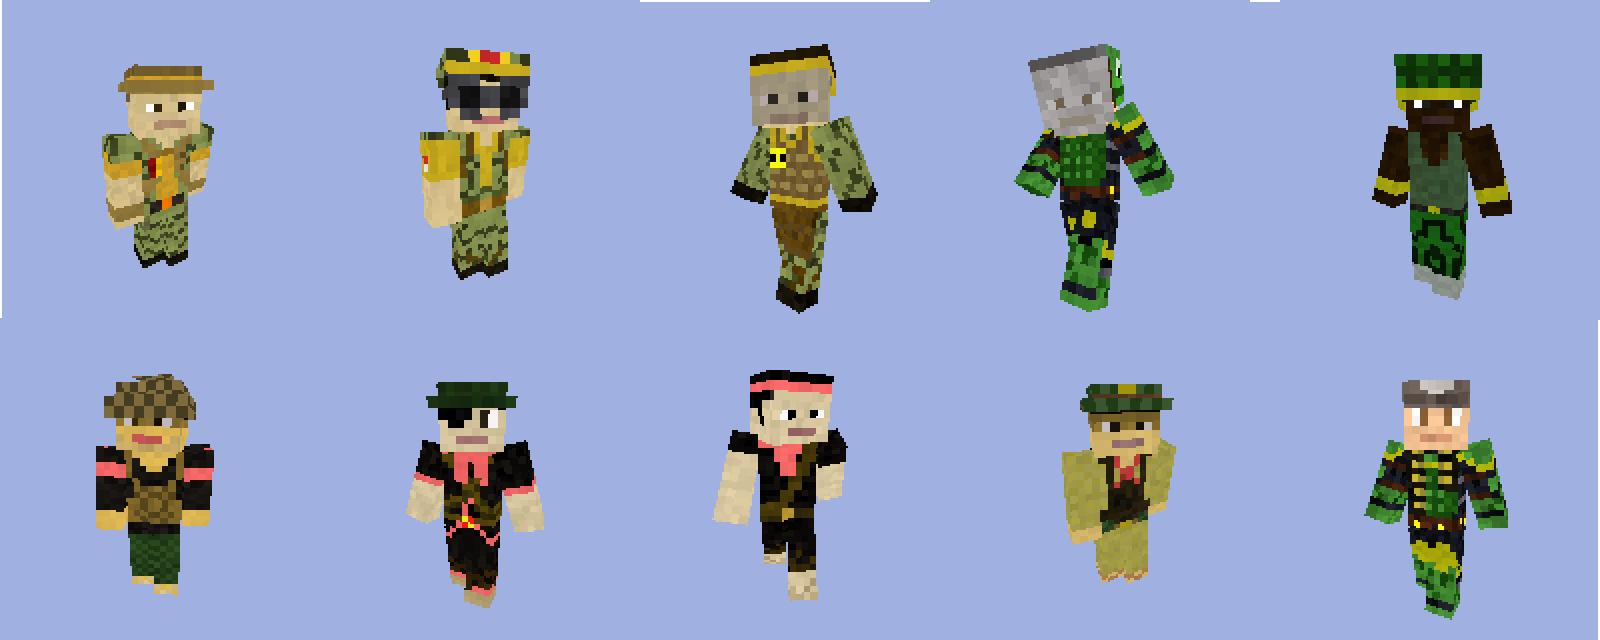 Minecraft - RA11 Paradox: Apocalypse Mini-Mod Skins addon - Mod DB